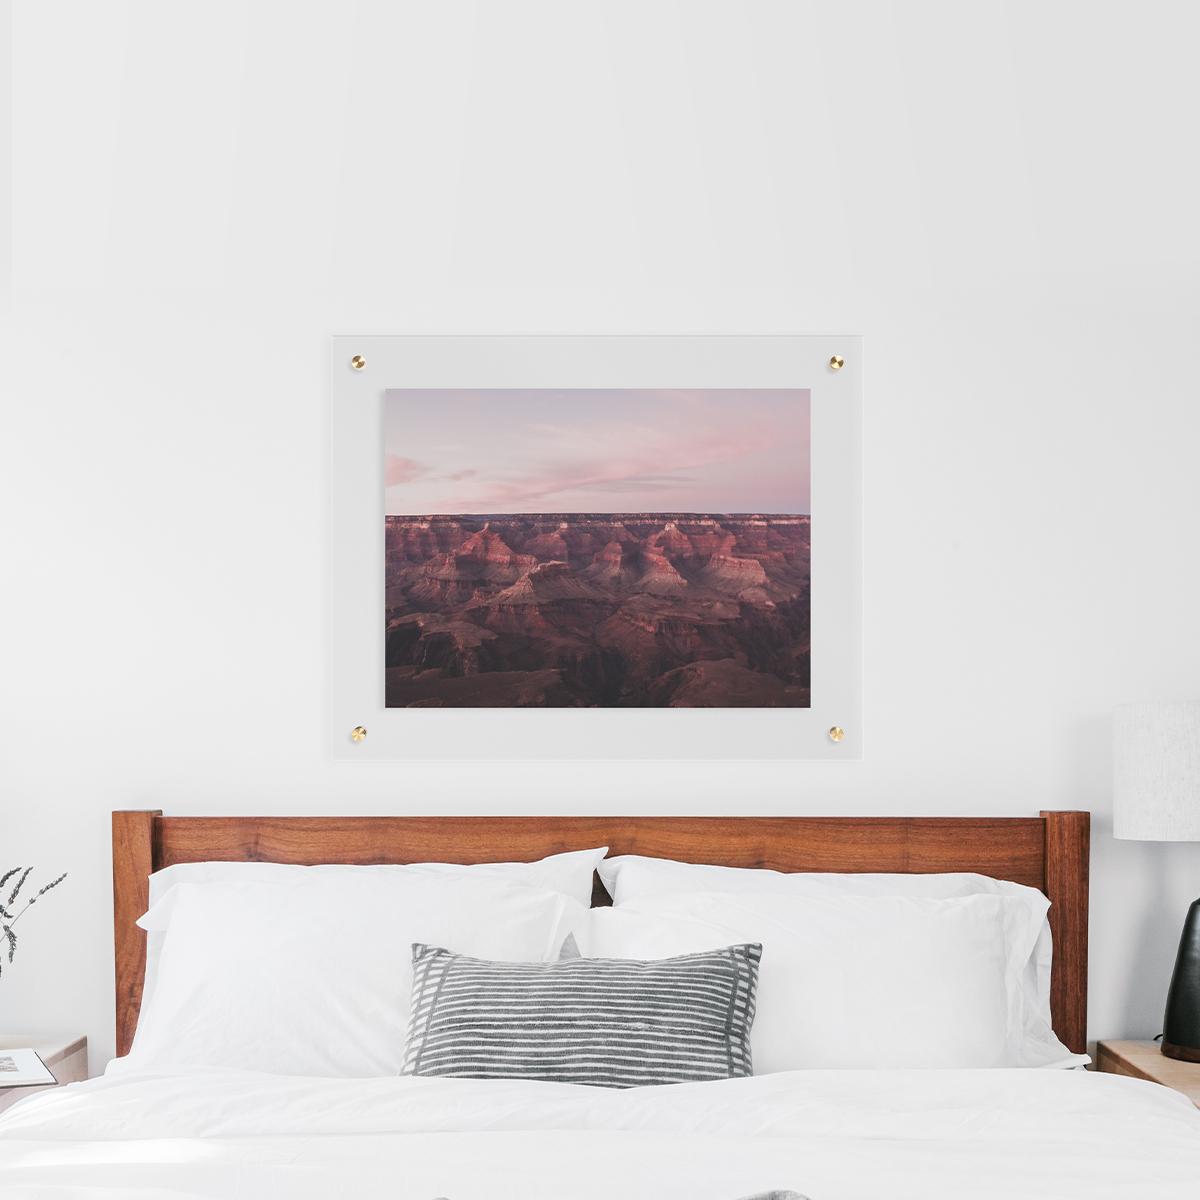 Floating frame with desert landscape hanging above white bed